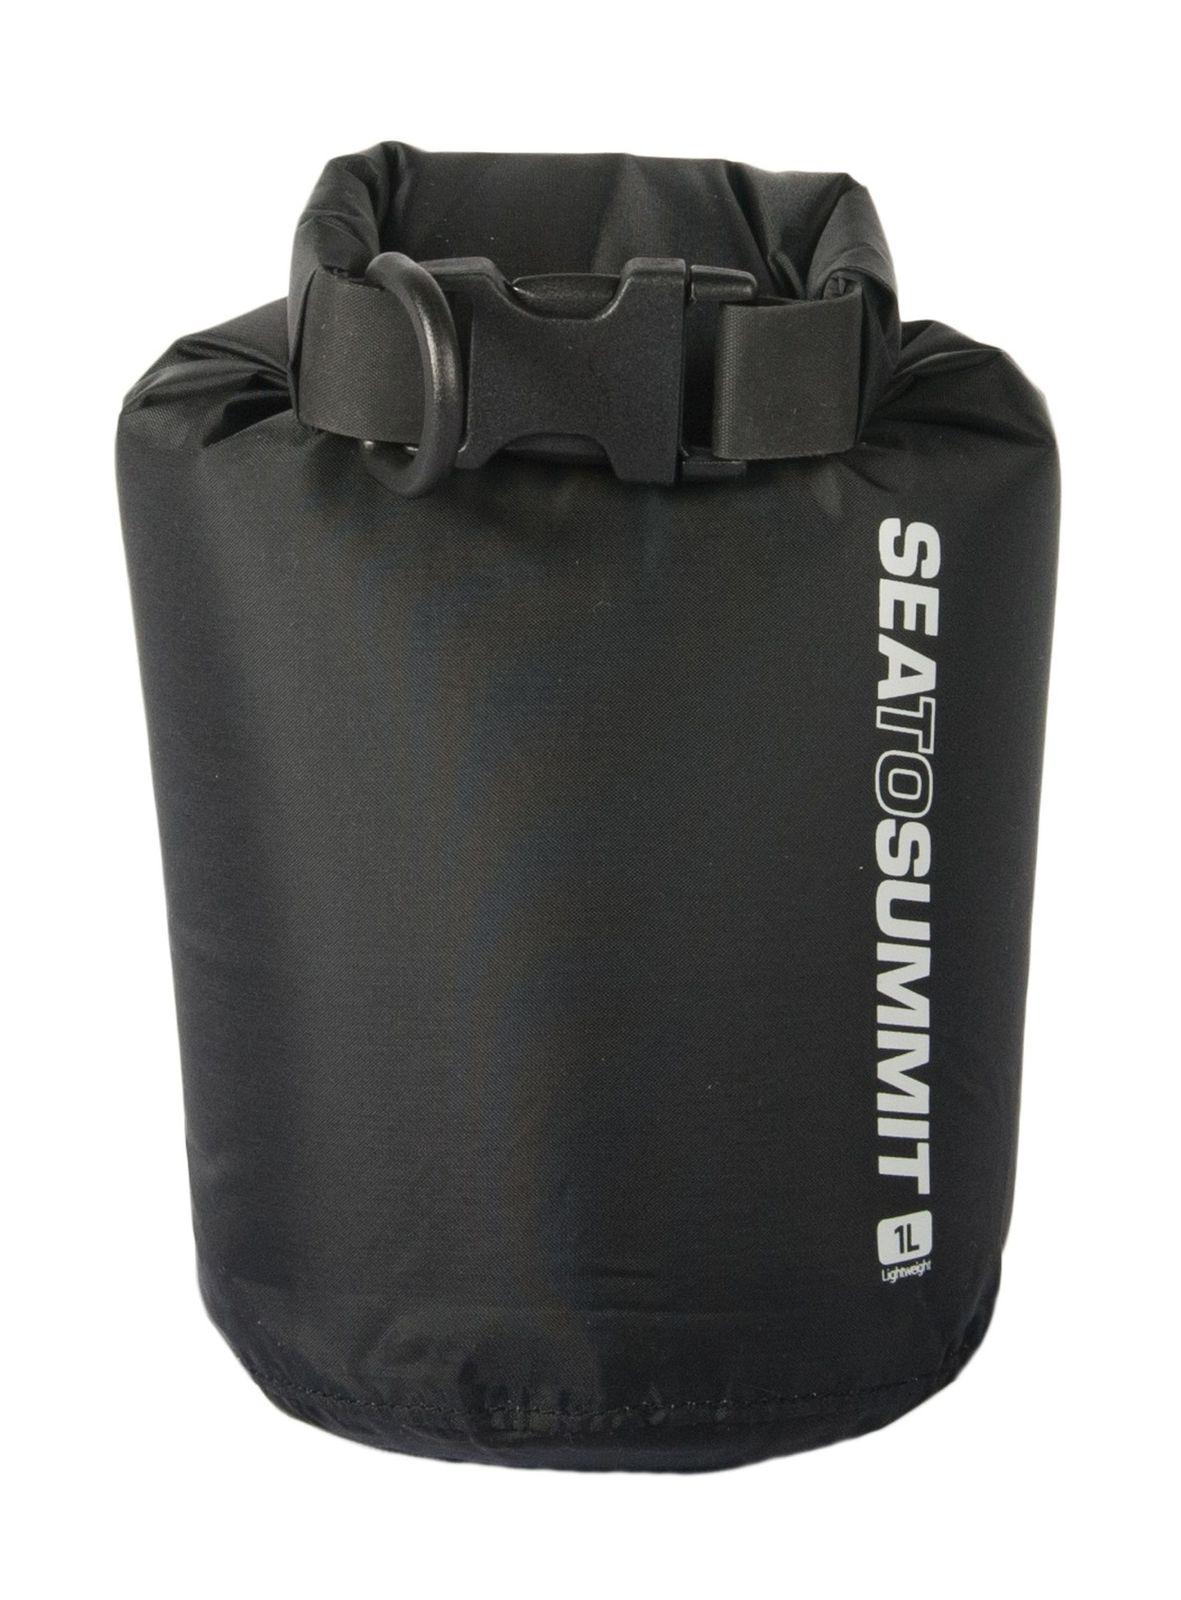 Sea To Summit Lightweight Dry Sack 1 L Black